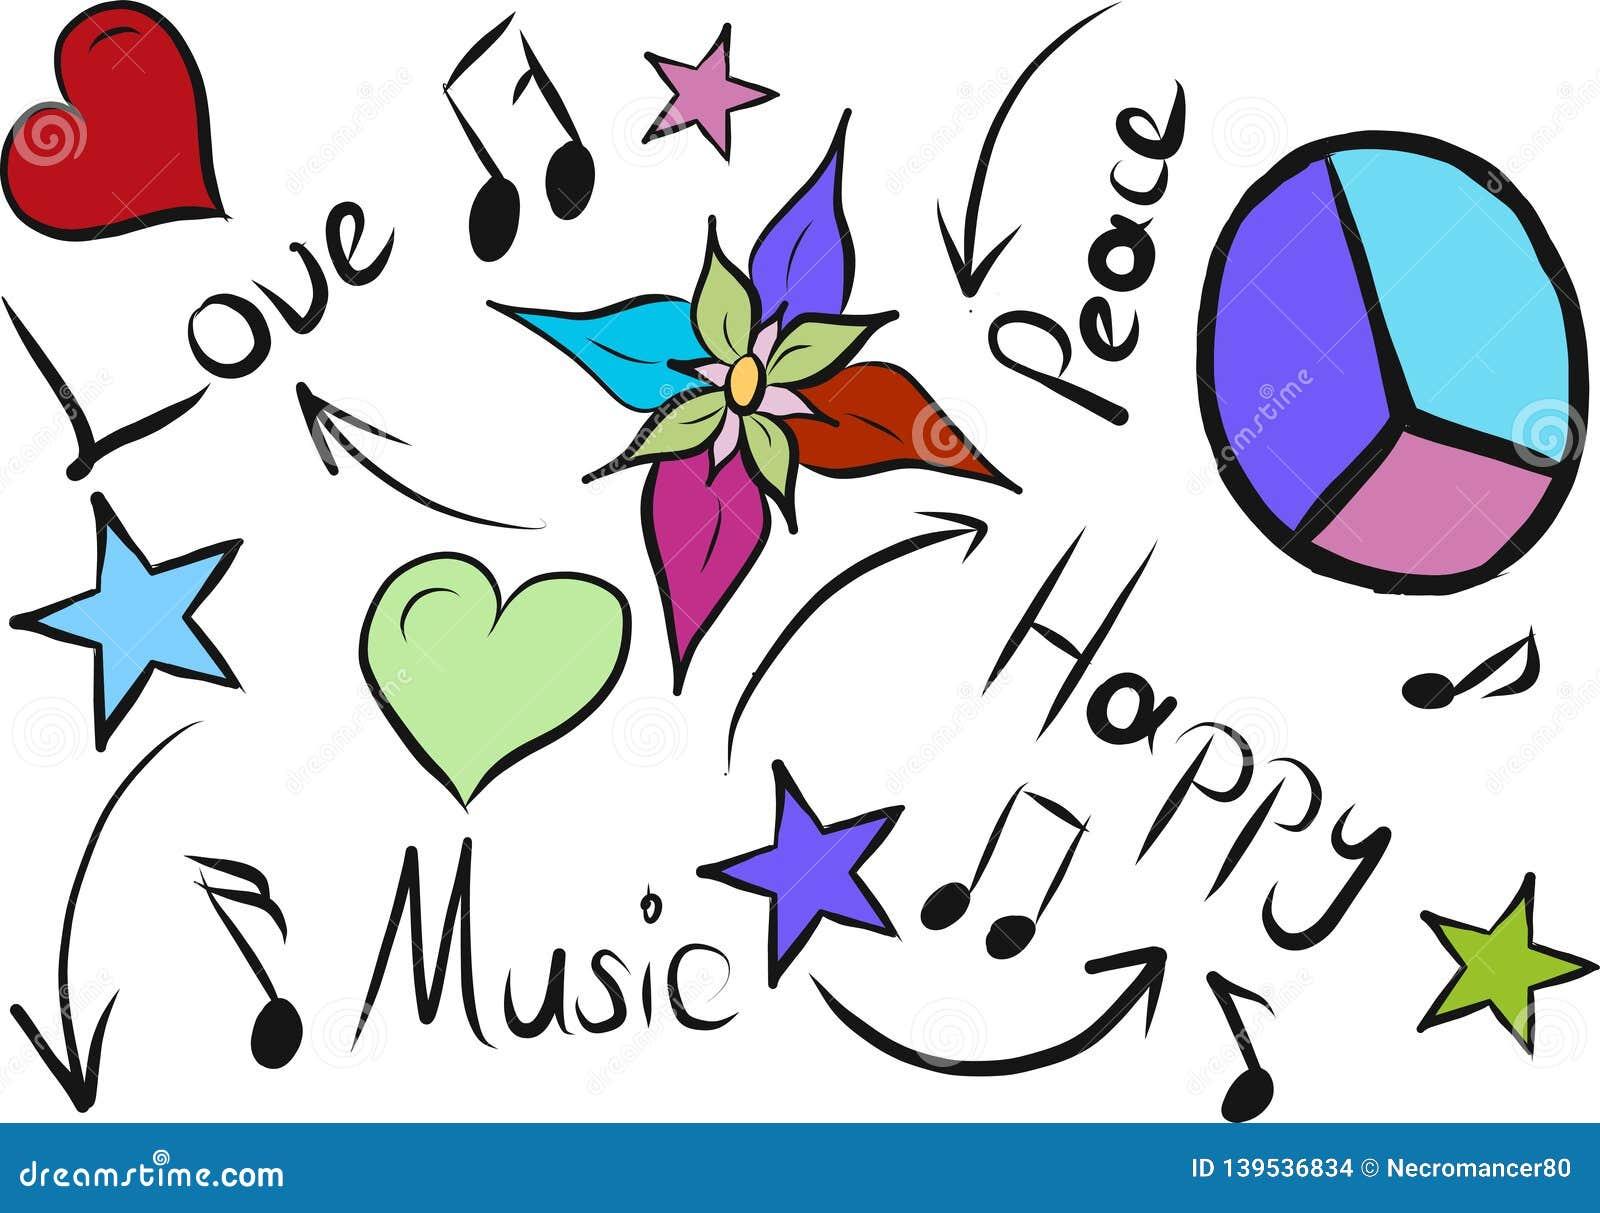 Love peace music happy sketch